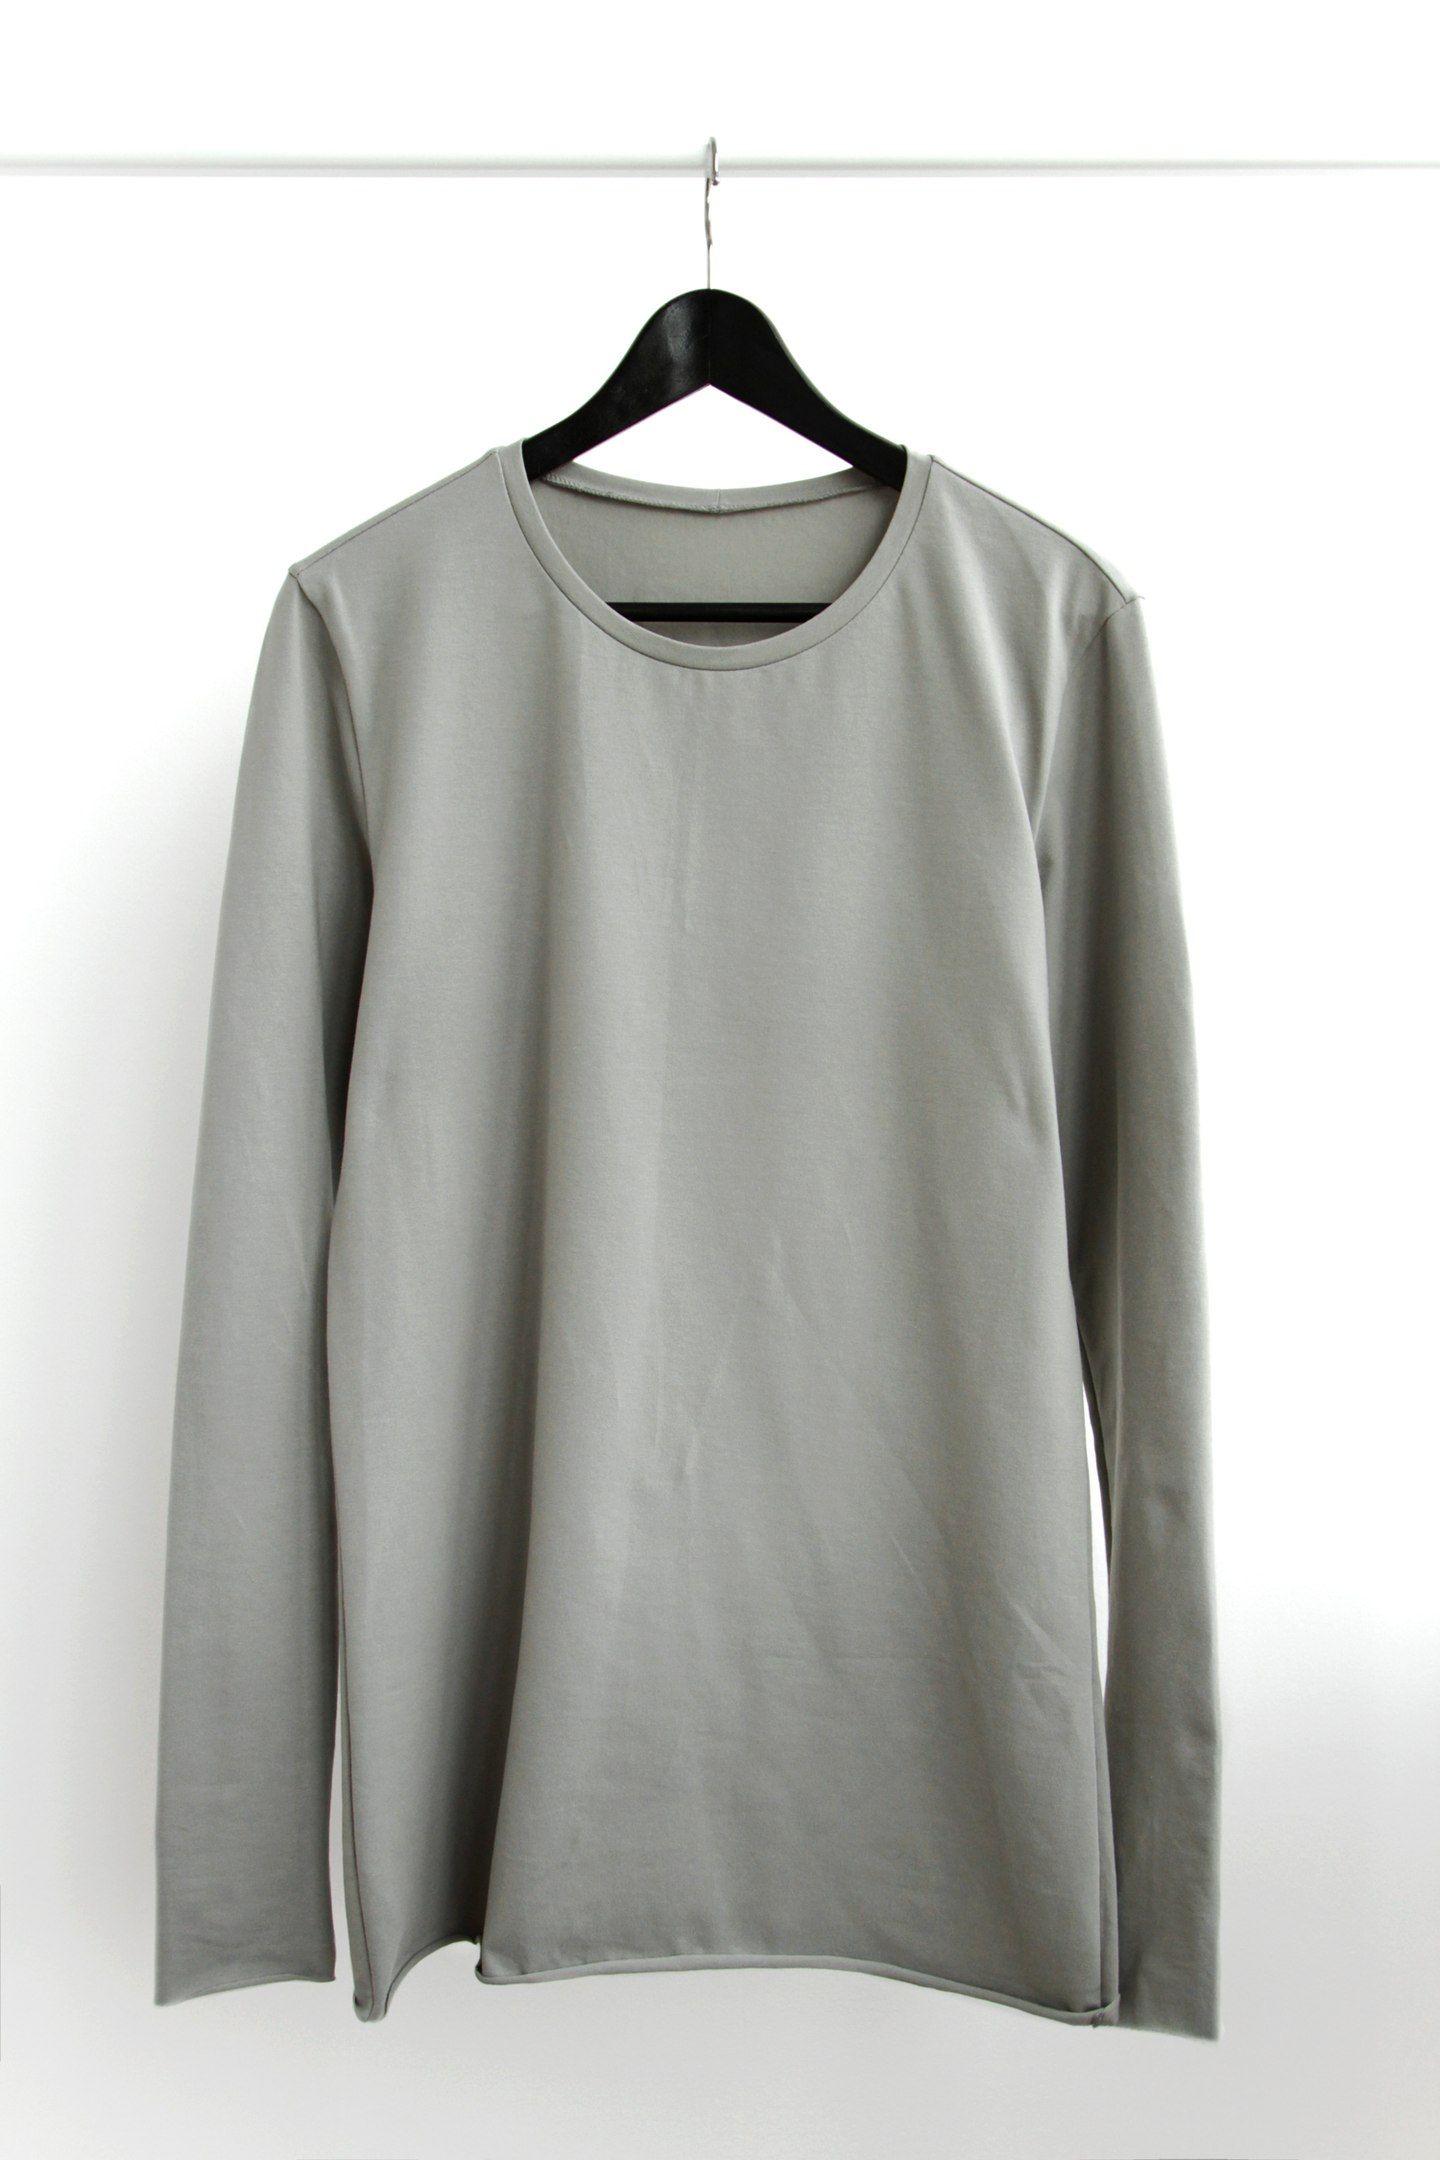 Handmade base cotton longsleeve in grey.